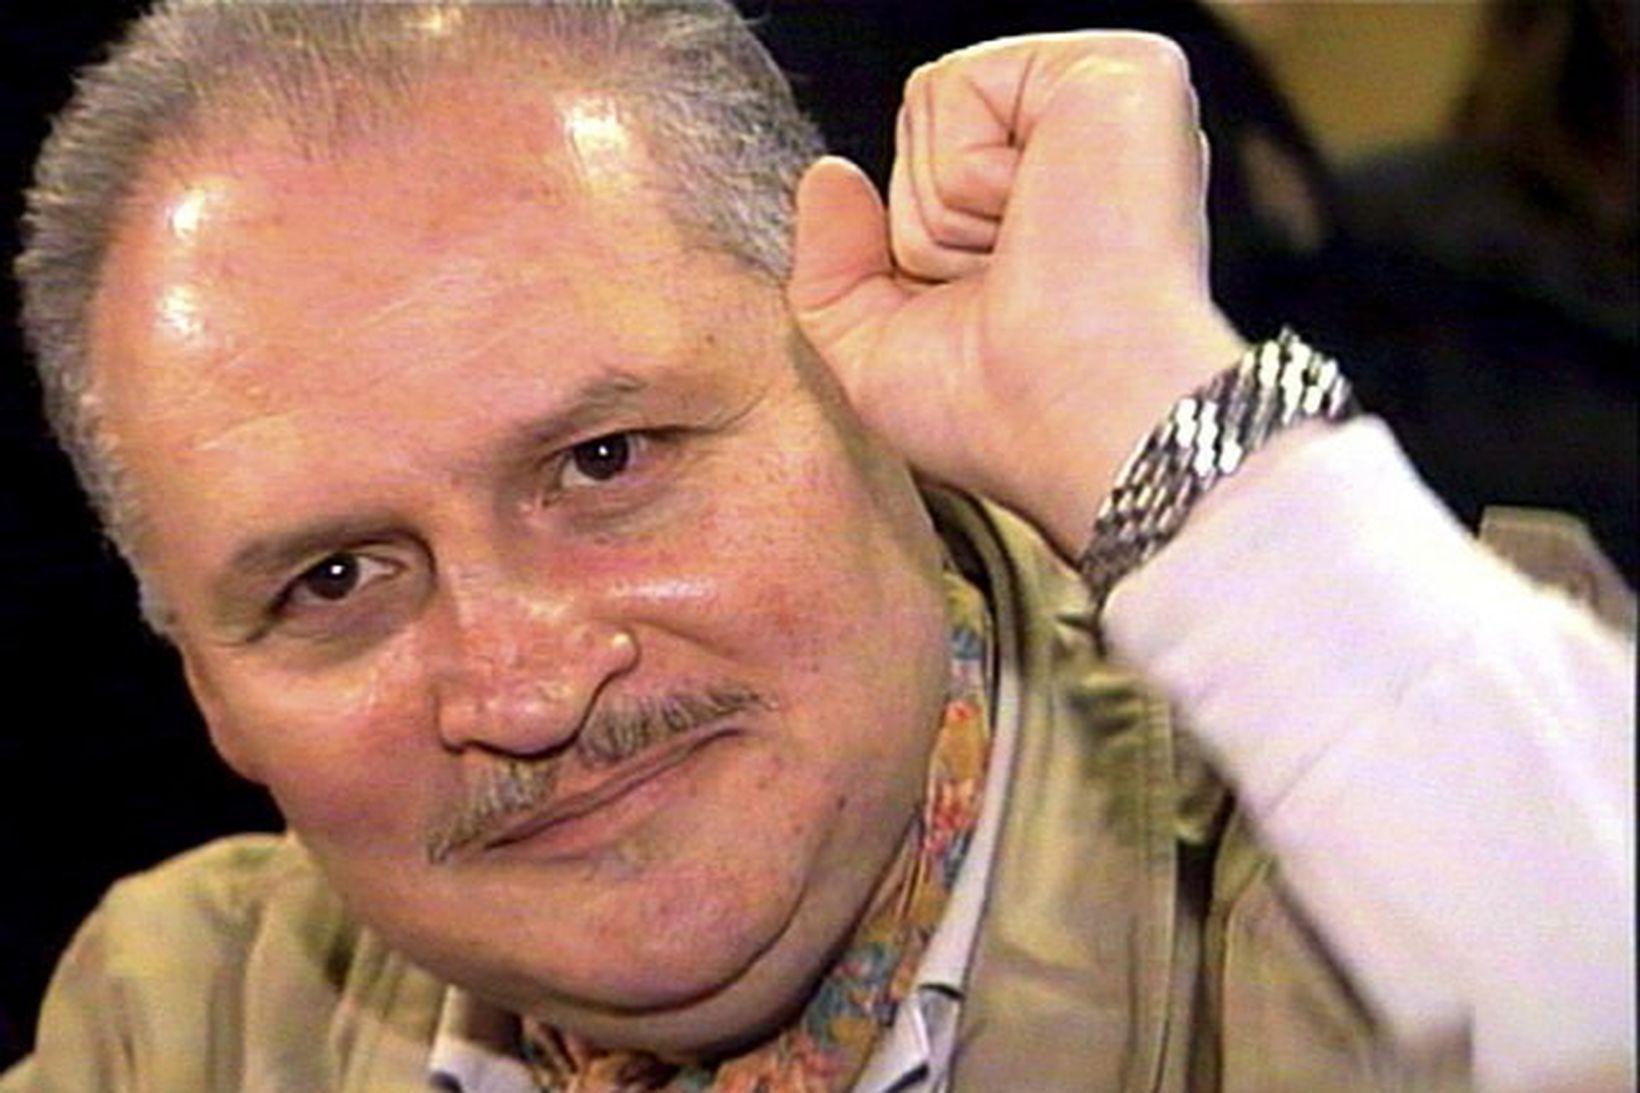 Sjakalinn, Ilich Ramirez Sanchez.